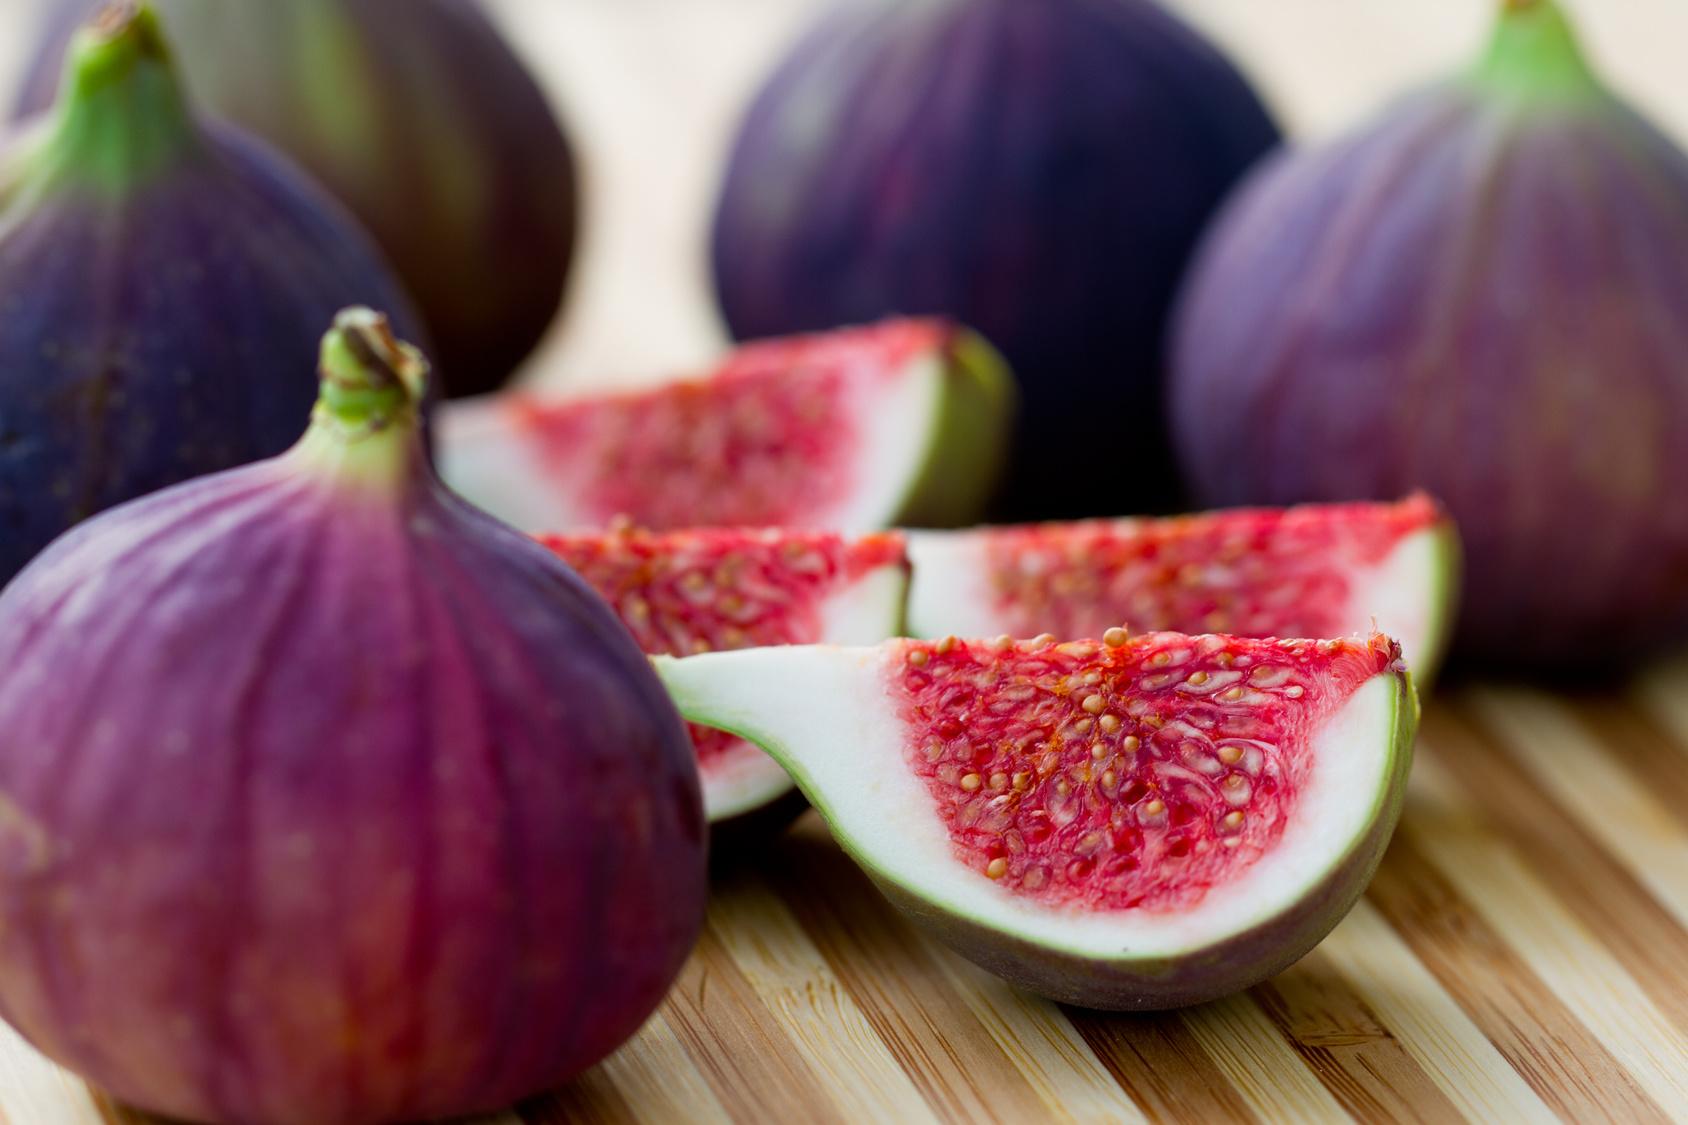 Figs fruits slice photos